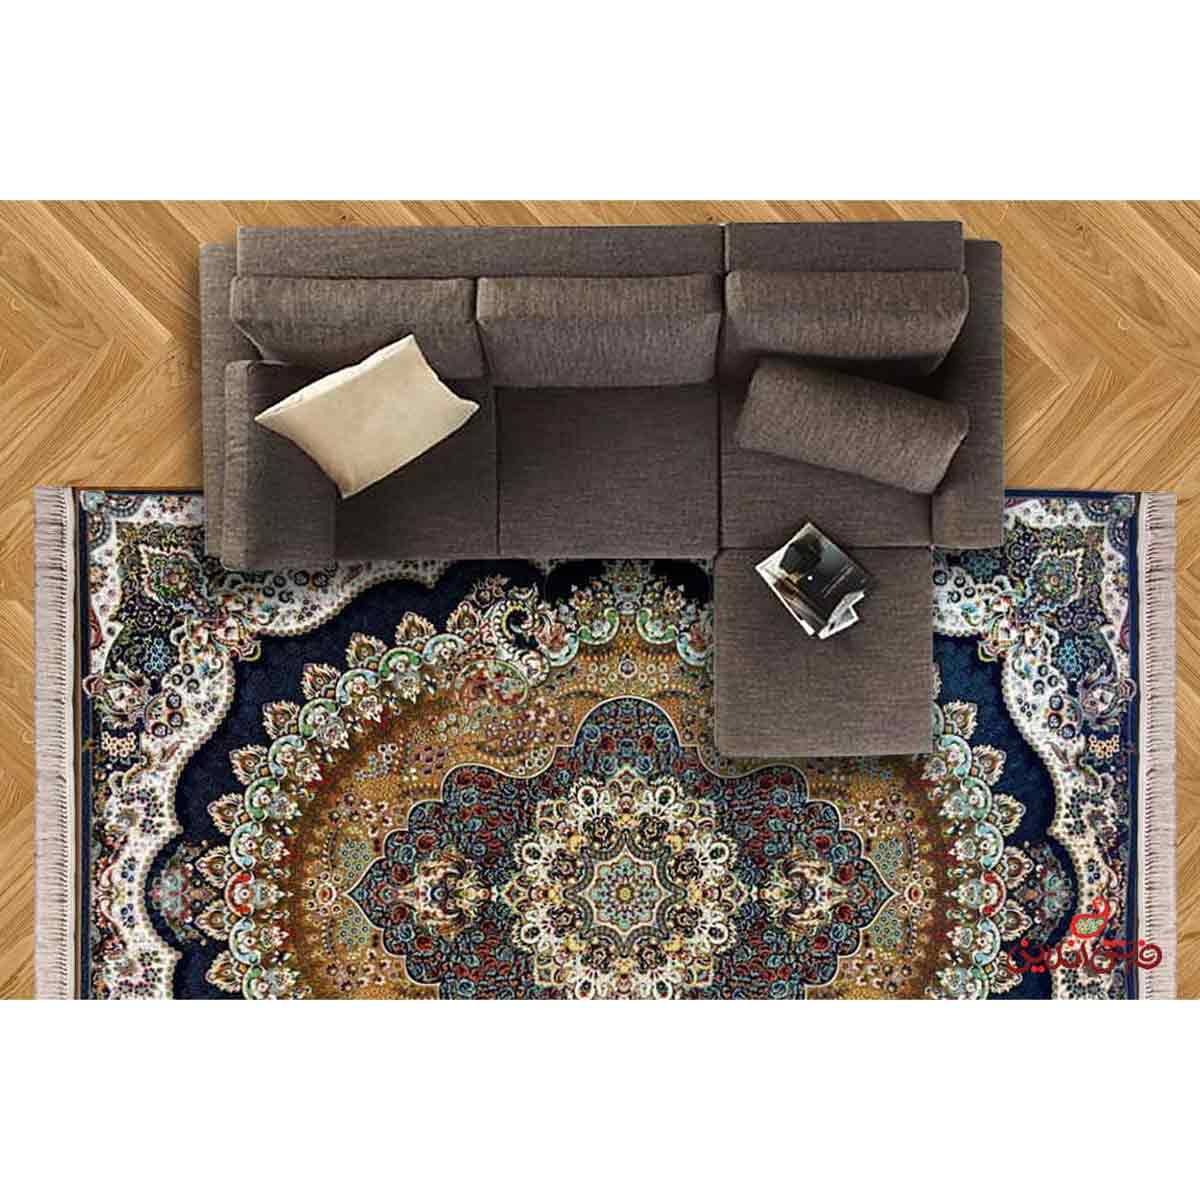 فرش ماشینی شاهکار صفویه طرح ارکیده گردویی